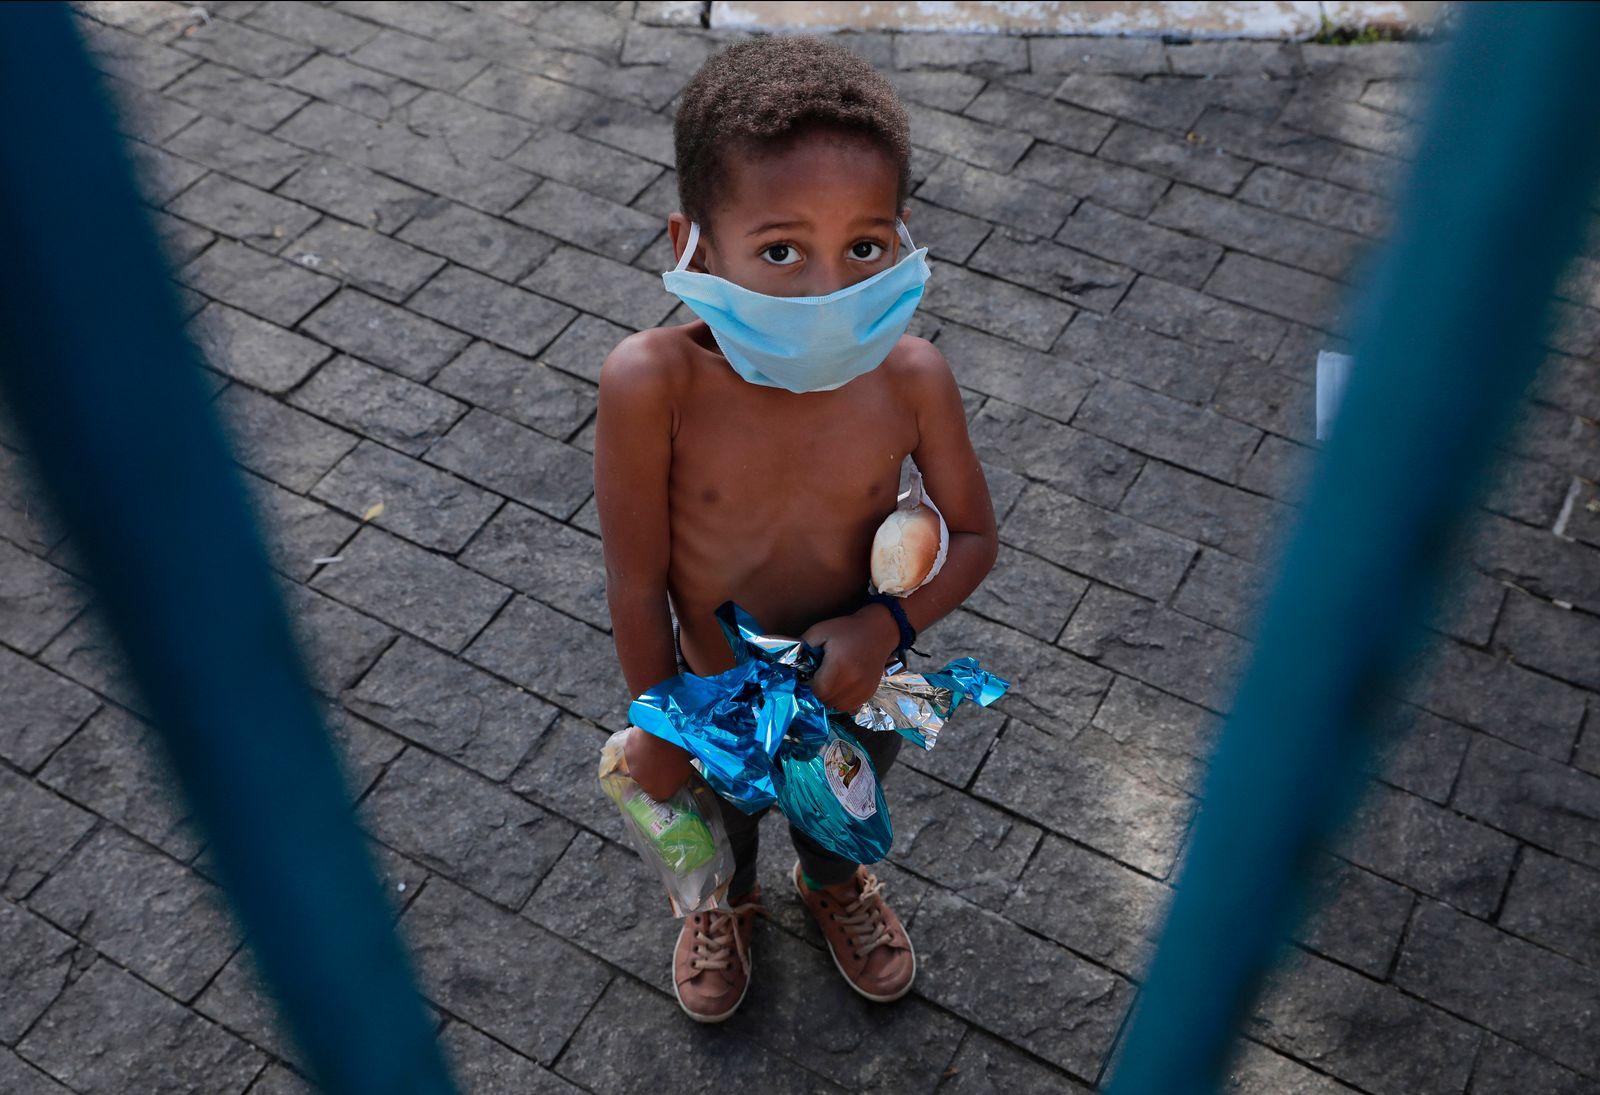 *** BESTPIX *** Food Distribution at Paroquia Sao Miguel Arcanjo da Mooca Amidst the Coronavirus (COVID - 19) Pandemic